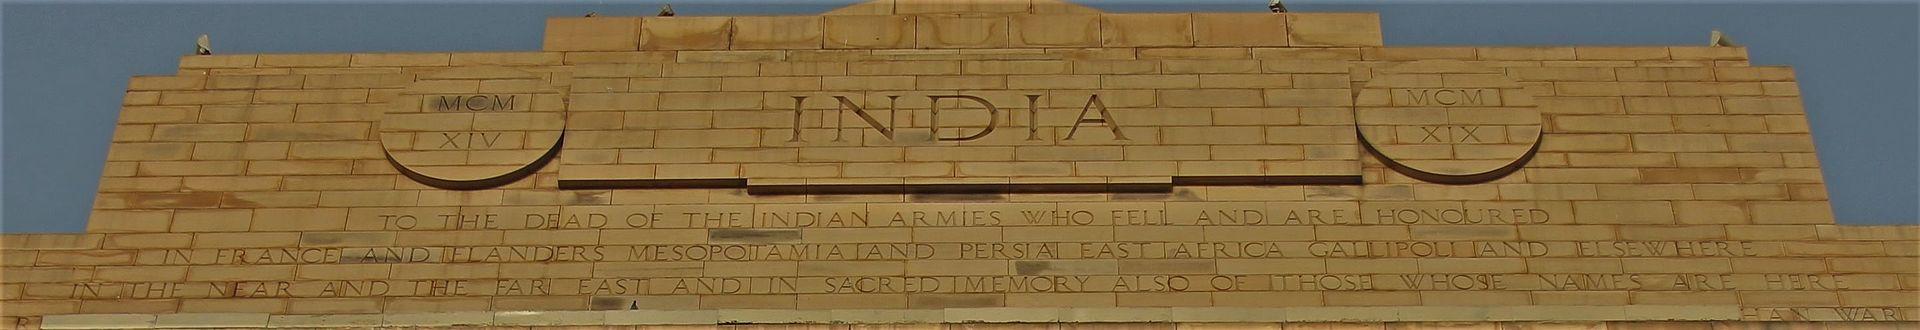 https://upload.wikimedia.org/wikipedia/commons/thumb/2/2e/Inscription_on_India_Gate.jpg/1920px-Inscription_on_India_Gate.jpg